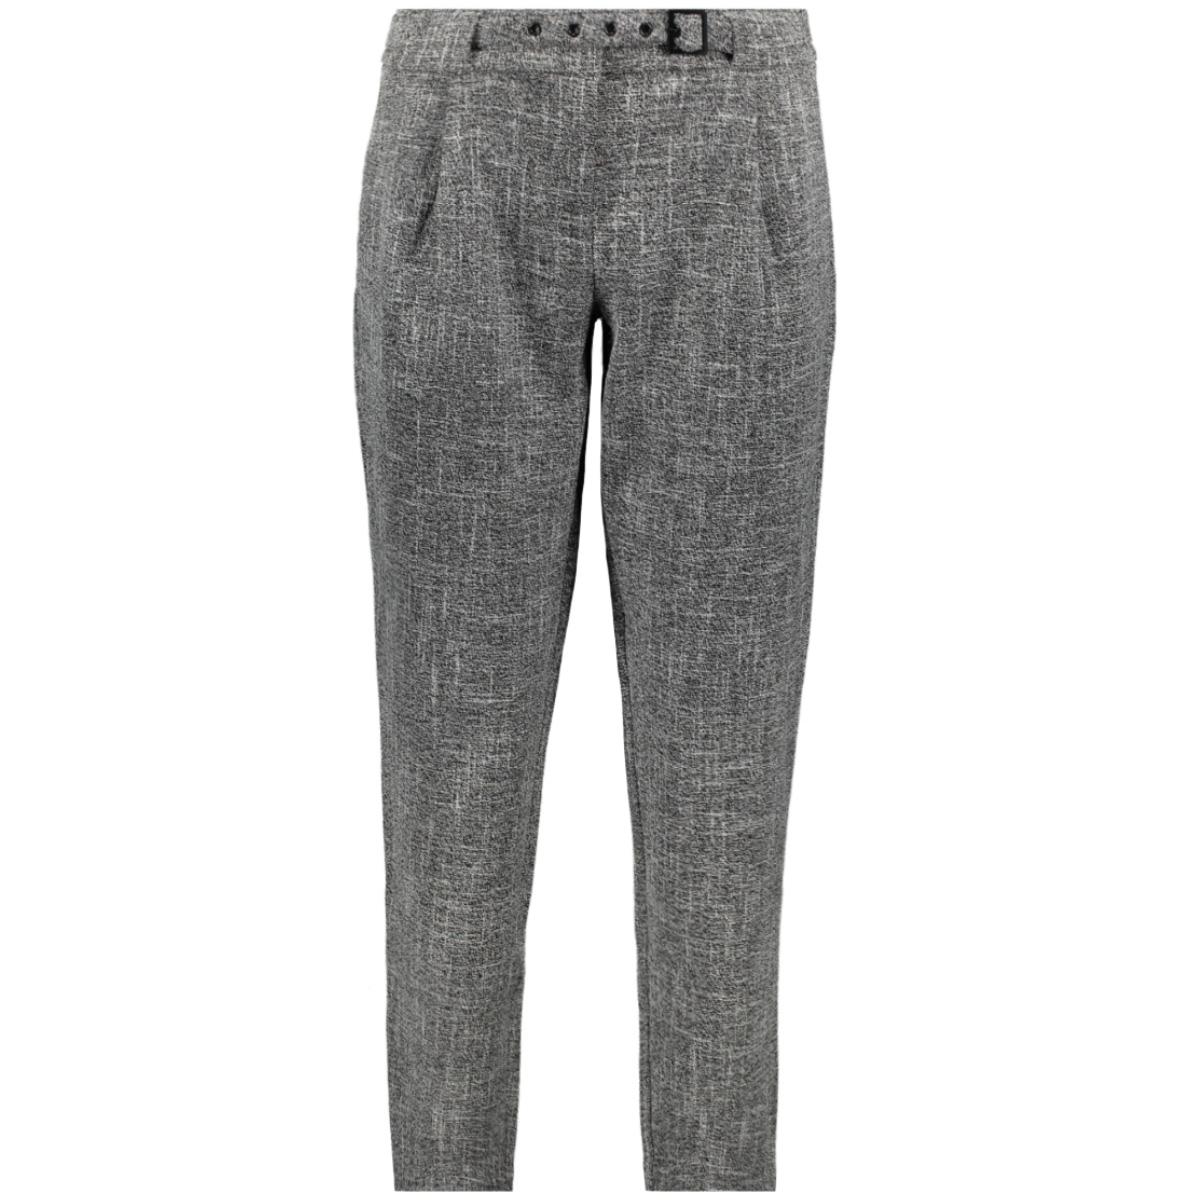 viboliva rw 7/8  pants 14053703 vila broek medium grey melange